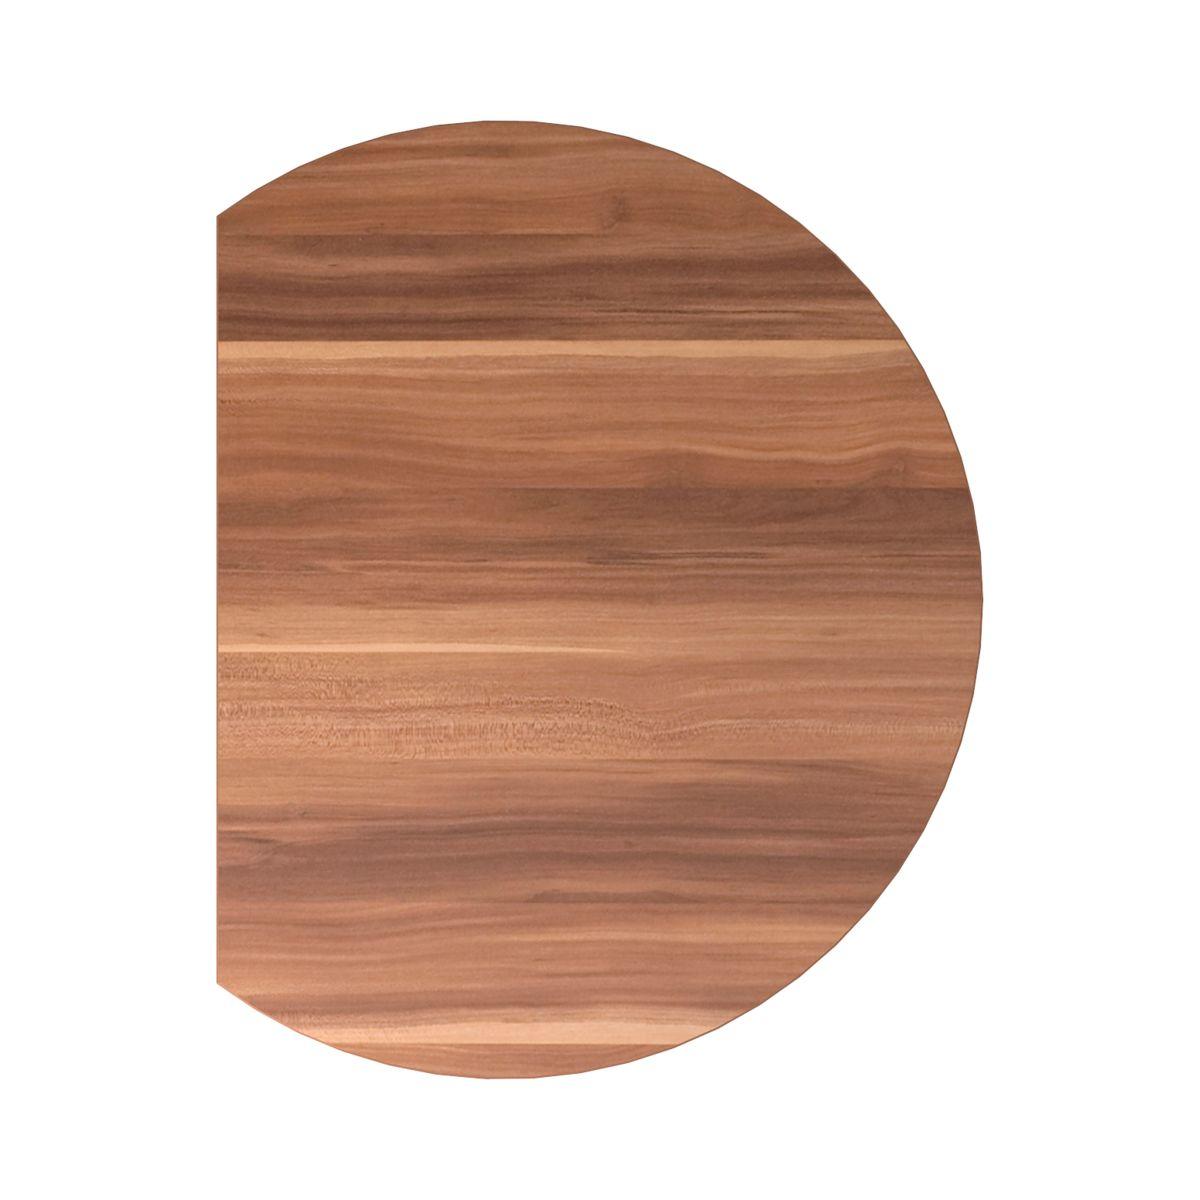 ansatztisch ulm li od rechts b 800 x t 1000 x h 650. Black Bedroom Furniture Sets. Home Design Ideas